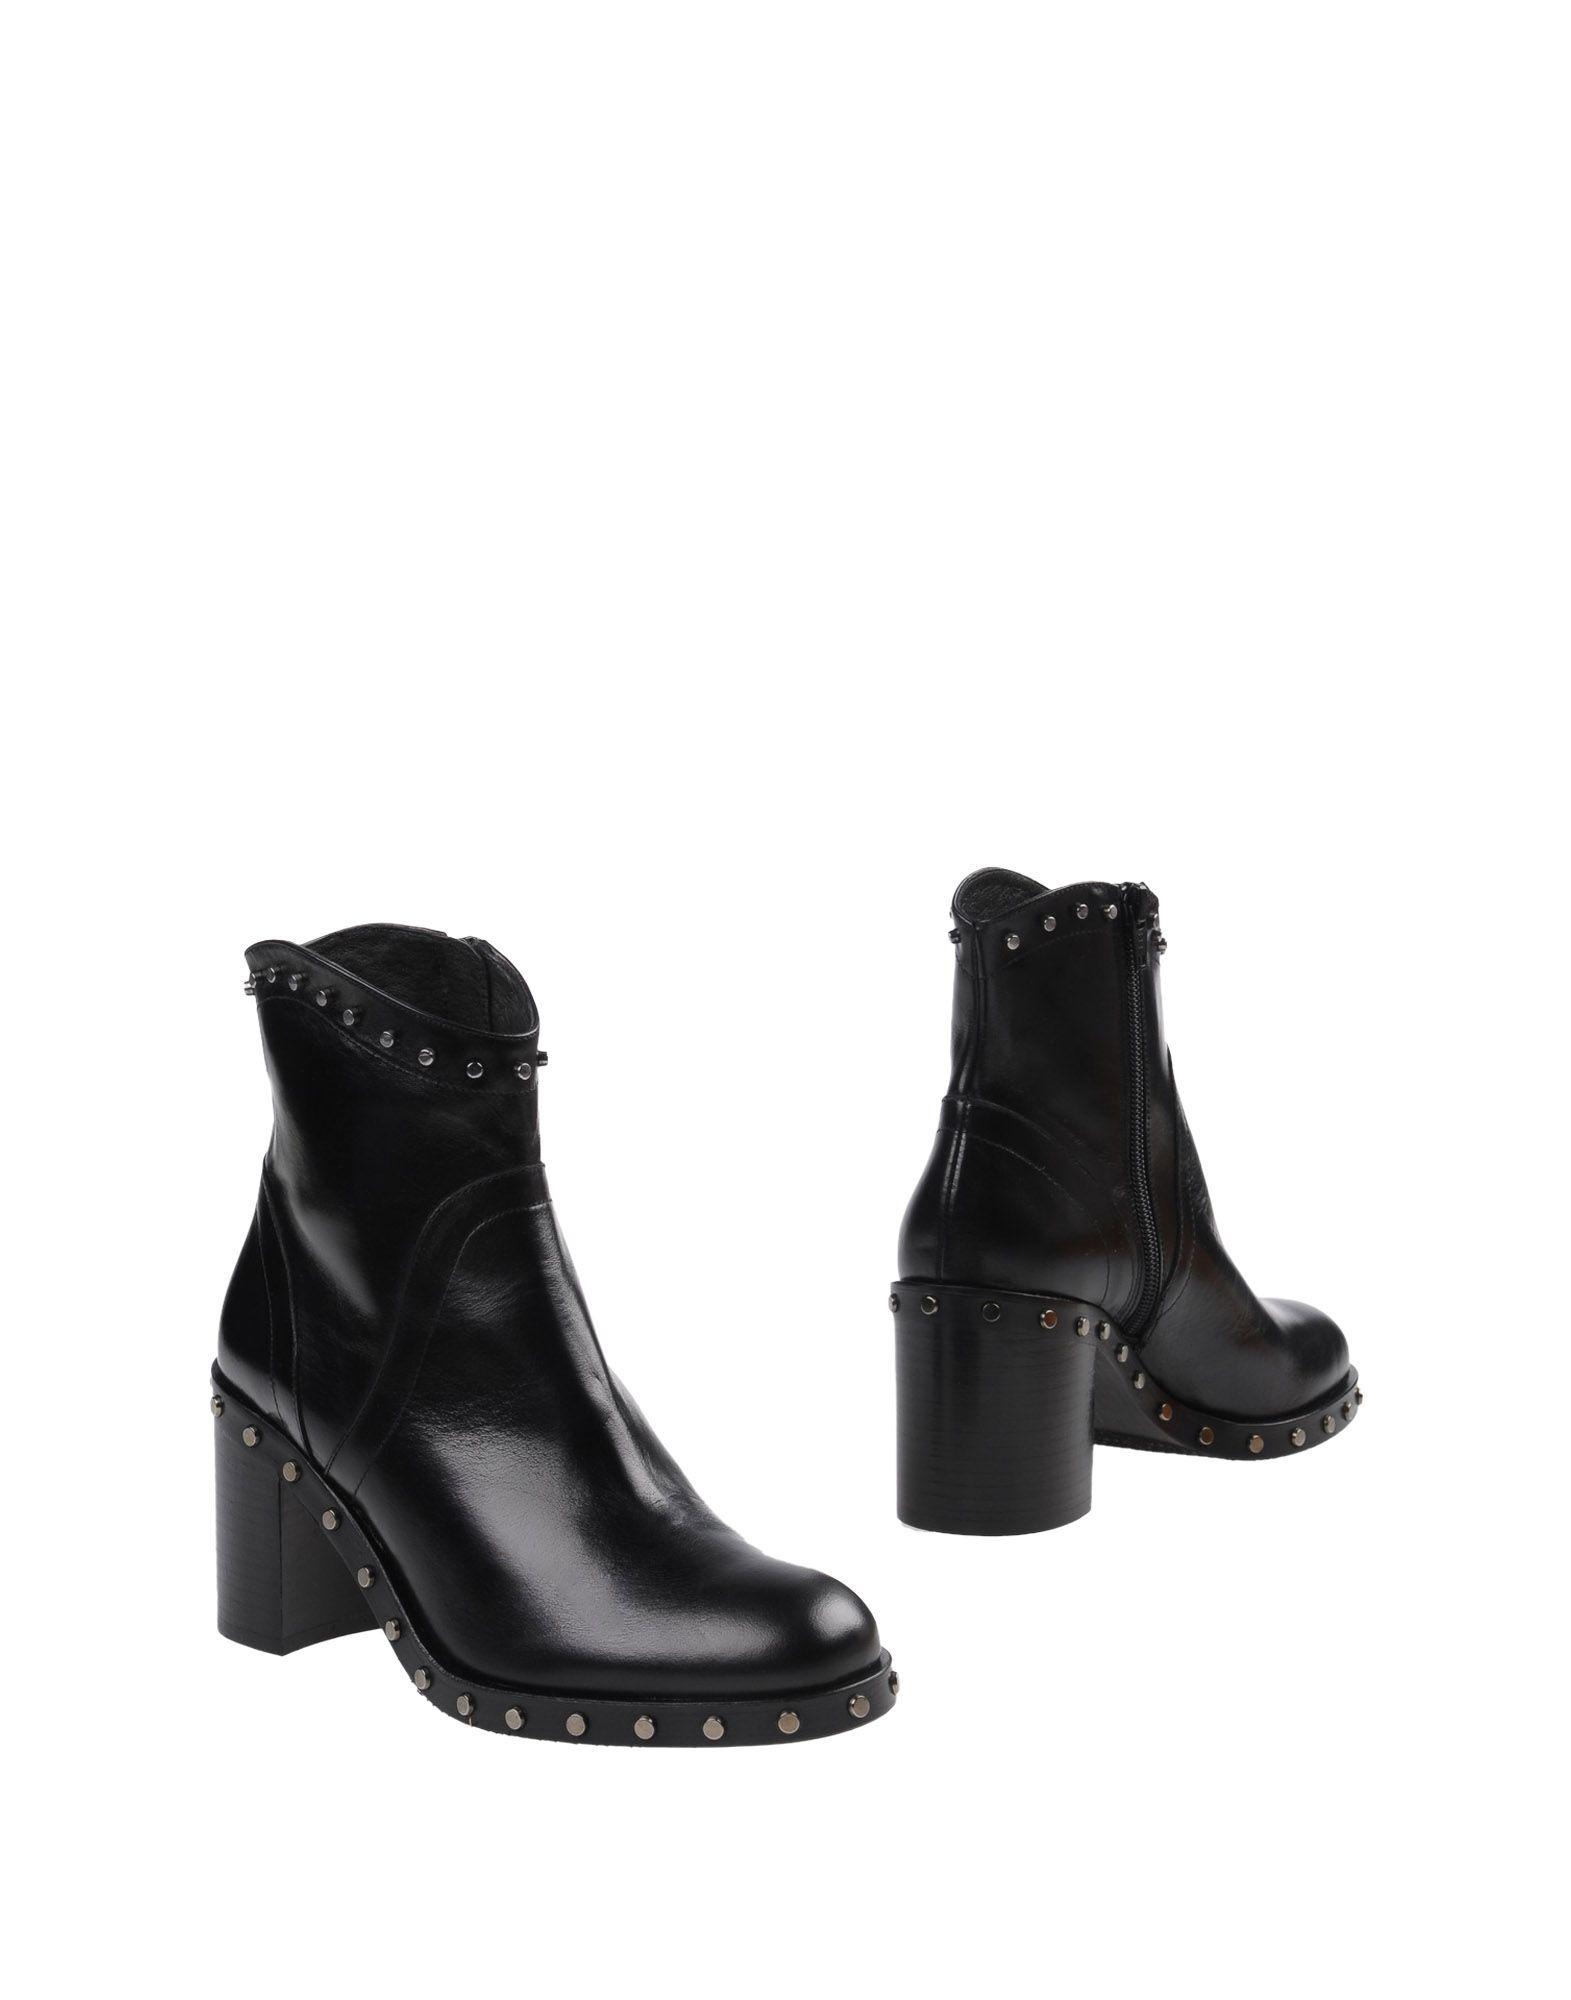 Zinda Schuhe Stiefelette Damen  11338539RL Heiße Schuhe Zinda 92f9b3